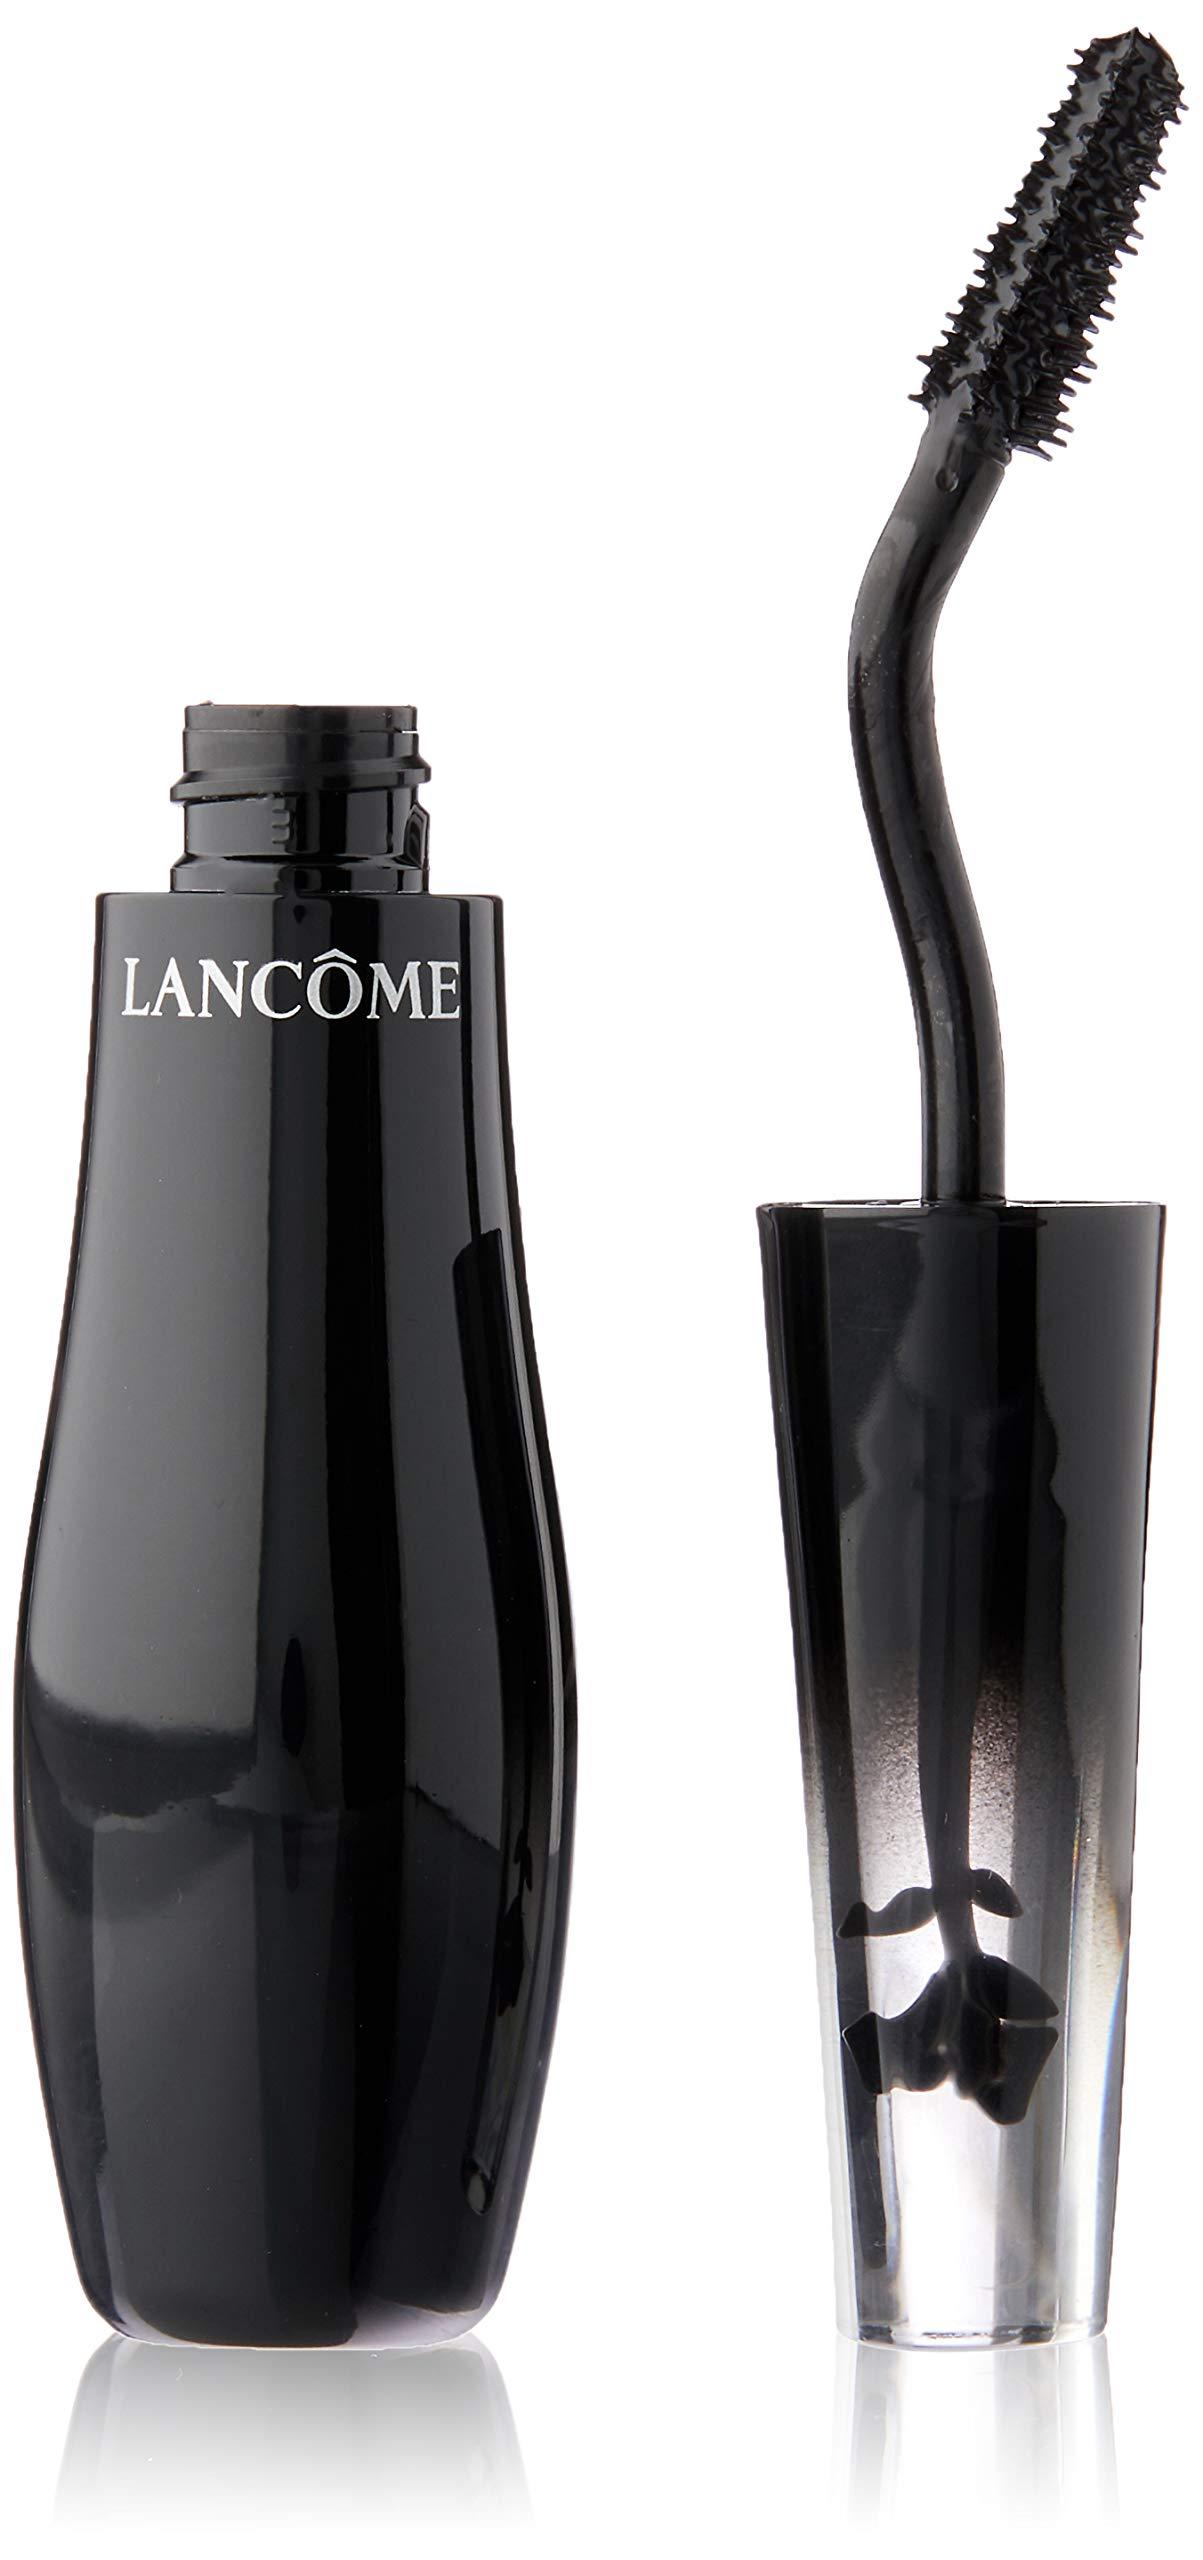 Lancome Grandiose Wide-Angle Fan Effect Mascara, Noir Mirifique, 0.35 Ounce